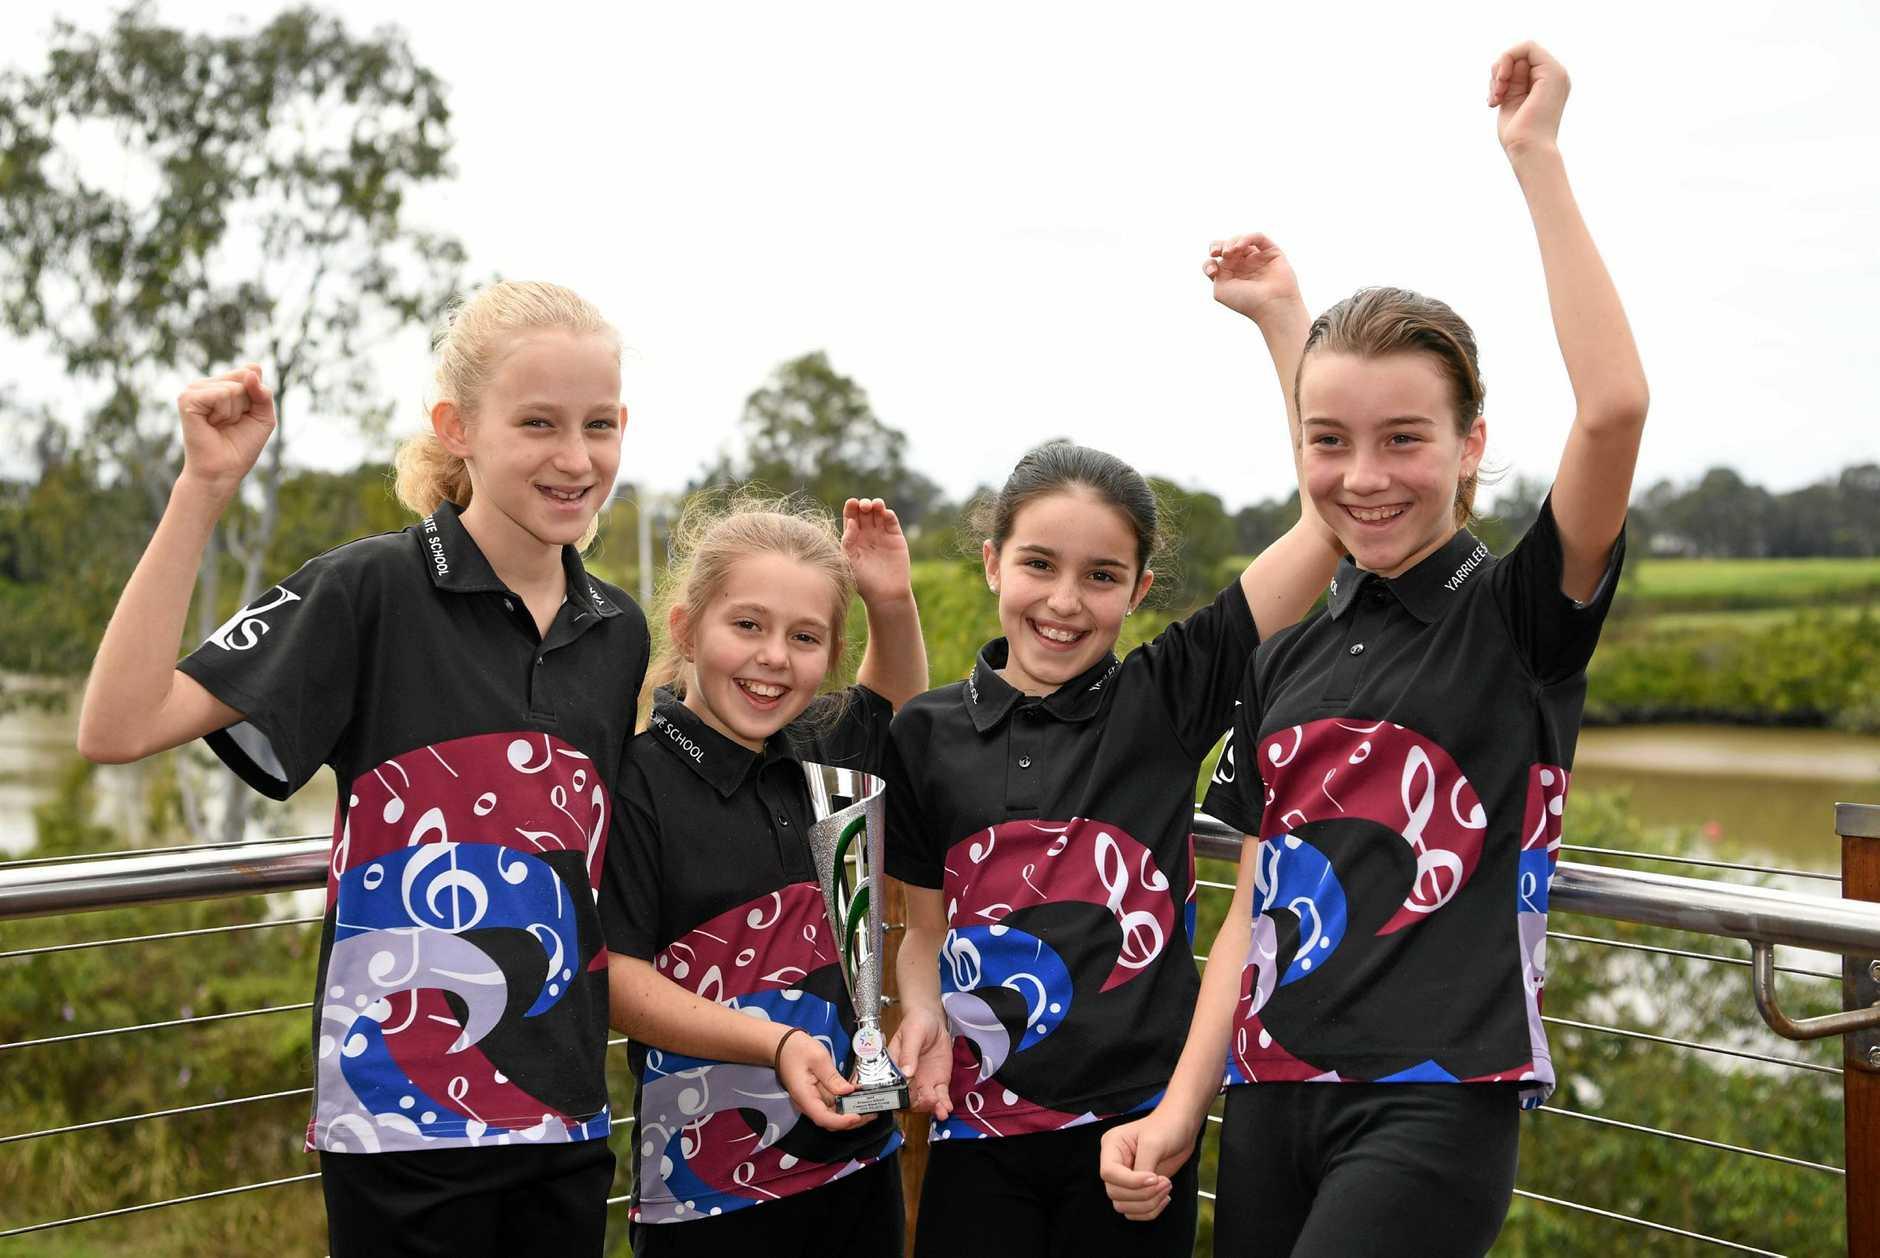 Maryborough Eisteddfod - (L) Serafina Andersen, Eva Templeton, Cienna Cathcart and Kaitlyn Turner from Yarrilee State School.